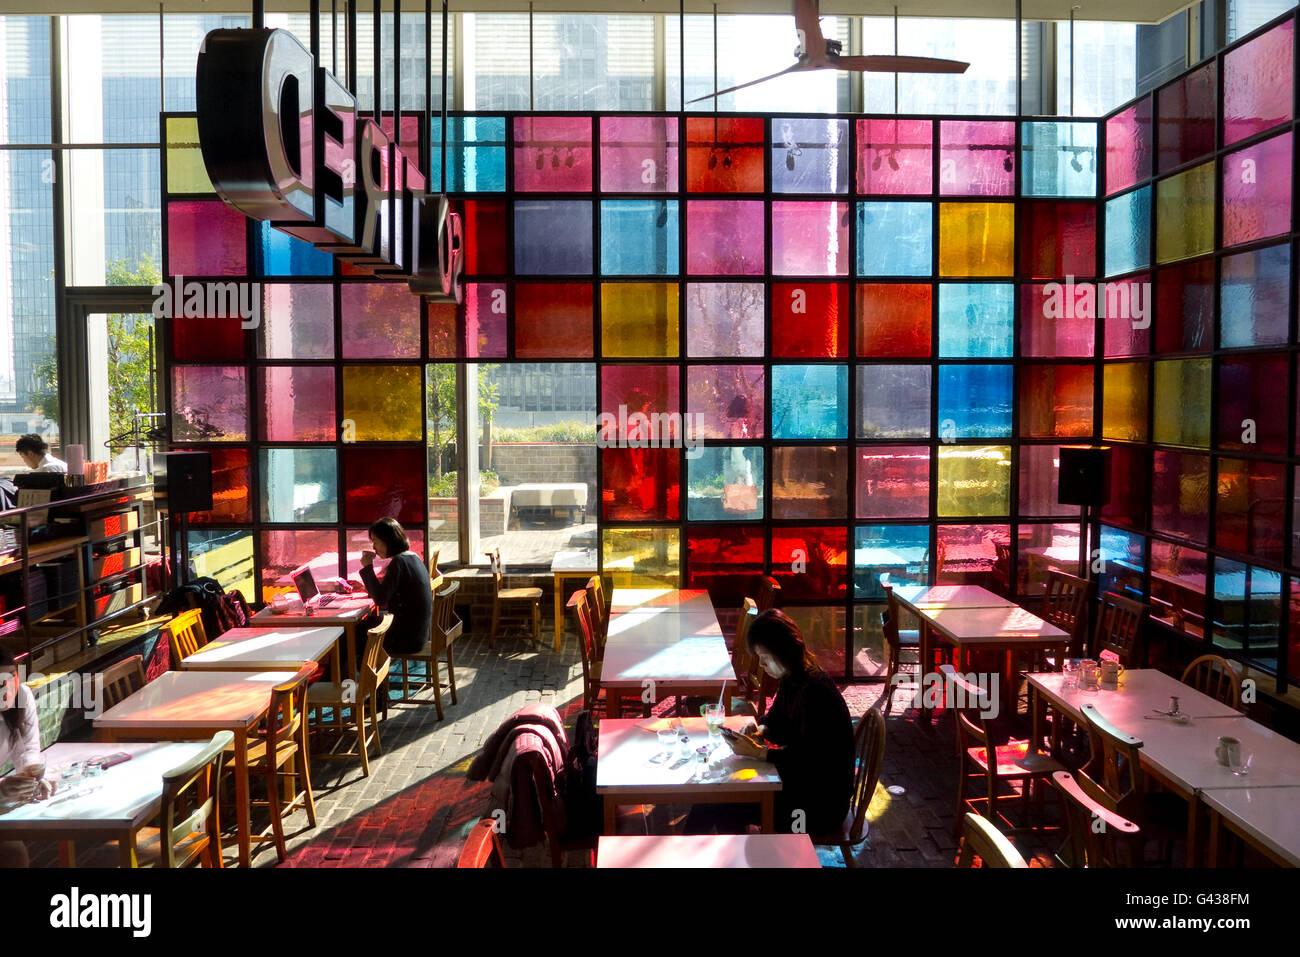 So Tired restaurant and cafe, Marunouchi, Chiyoda, Tokyo, Japan    Credit © Fabio Mazzarella/Sintesi/Alamy - Stock Image